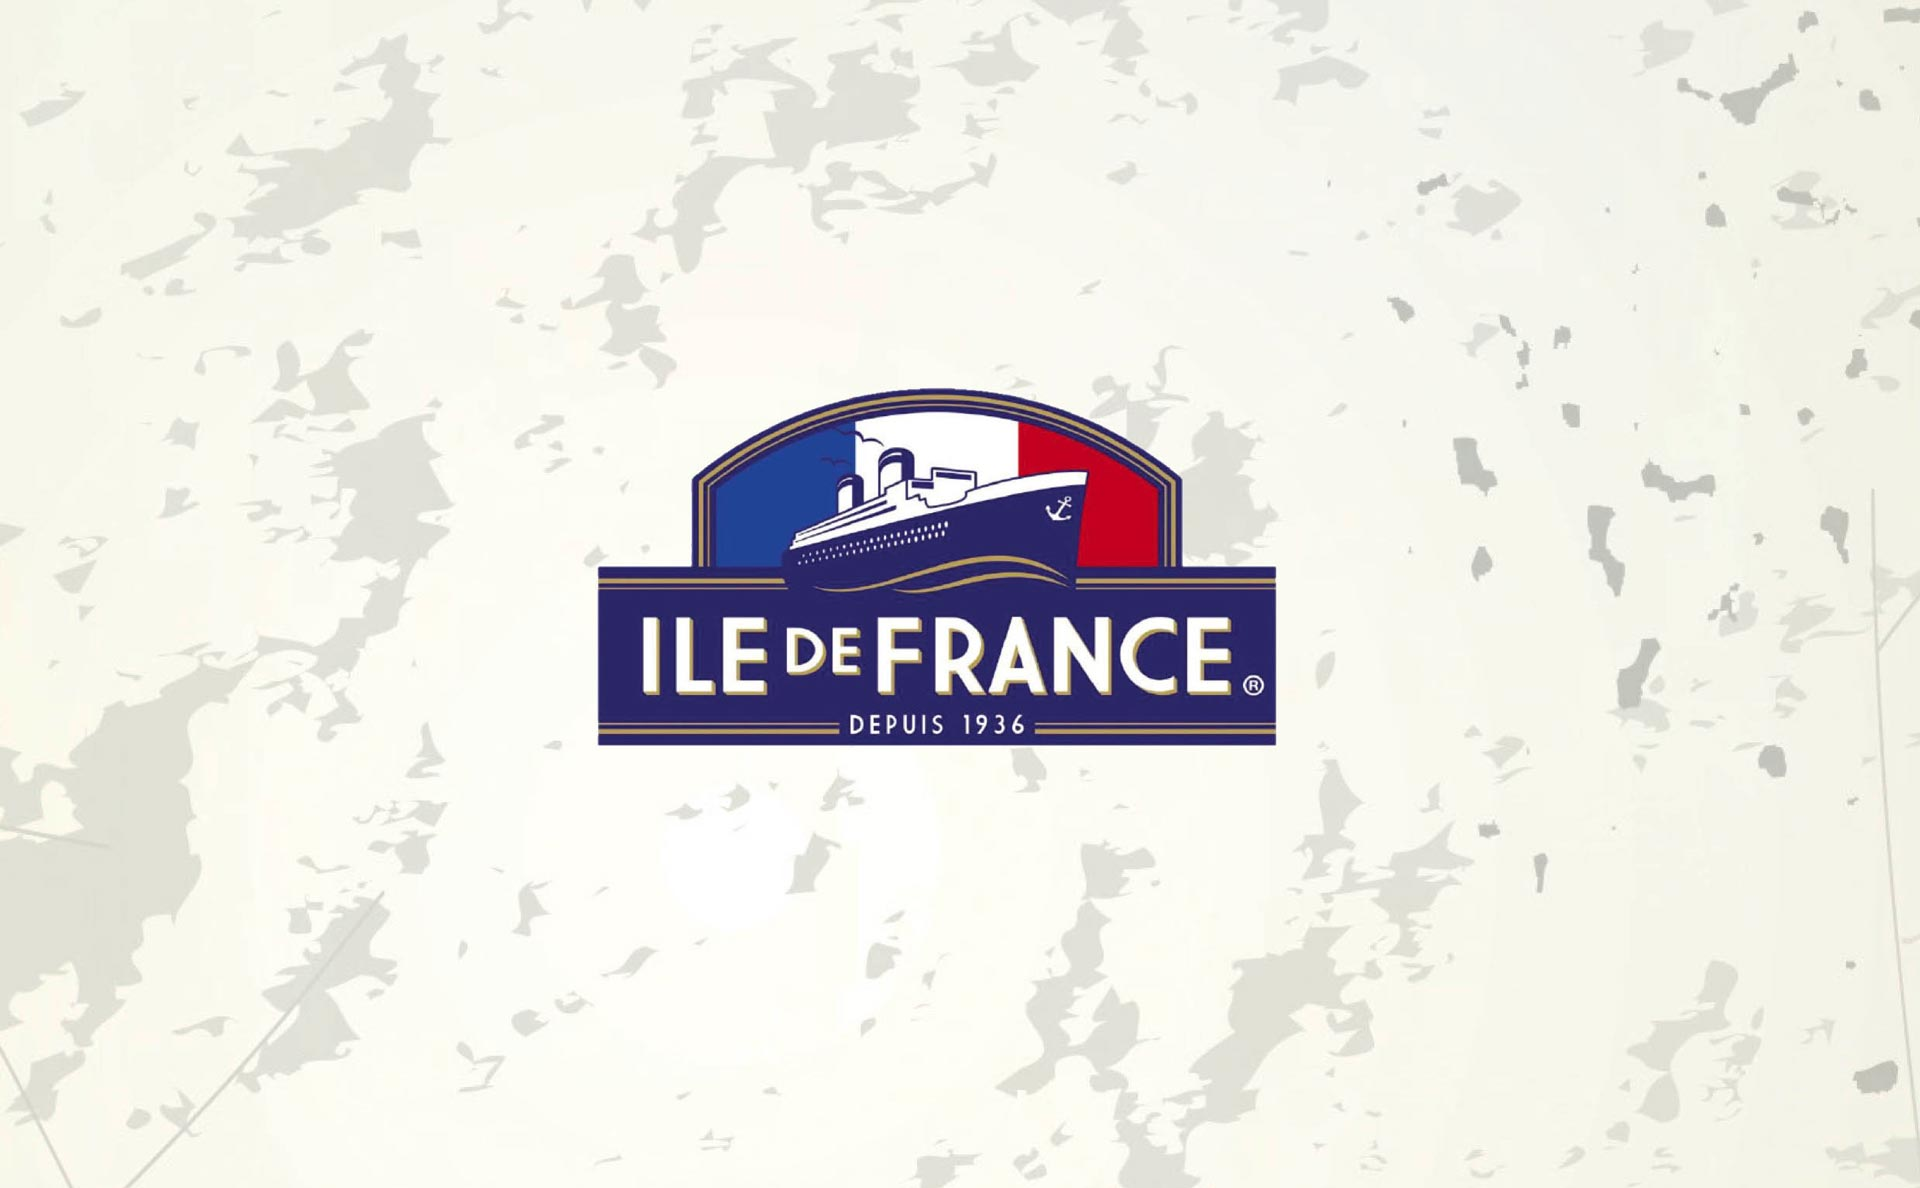 the logo ILE DE FRANCE®